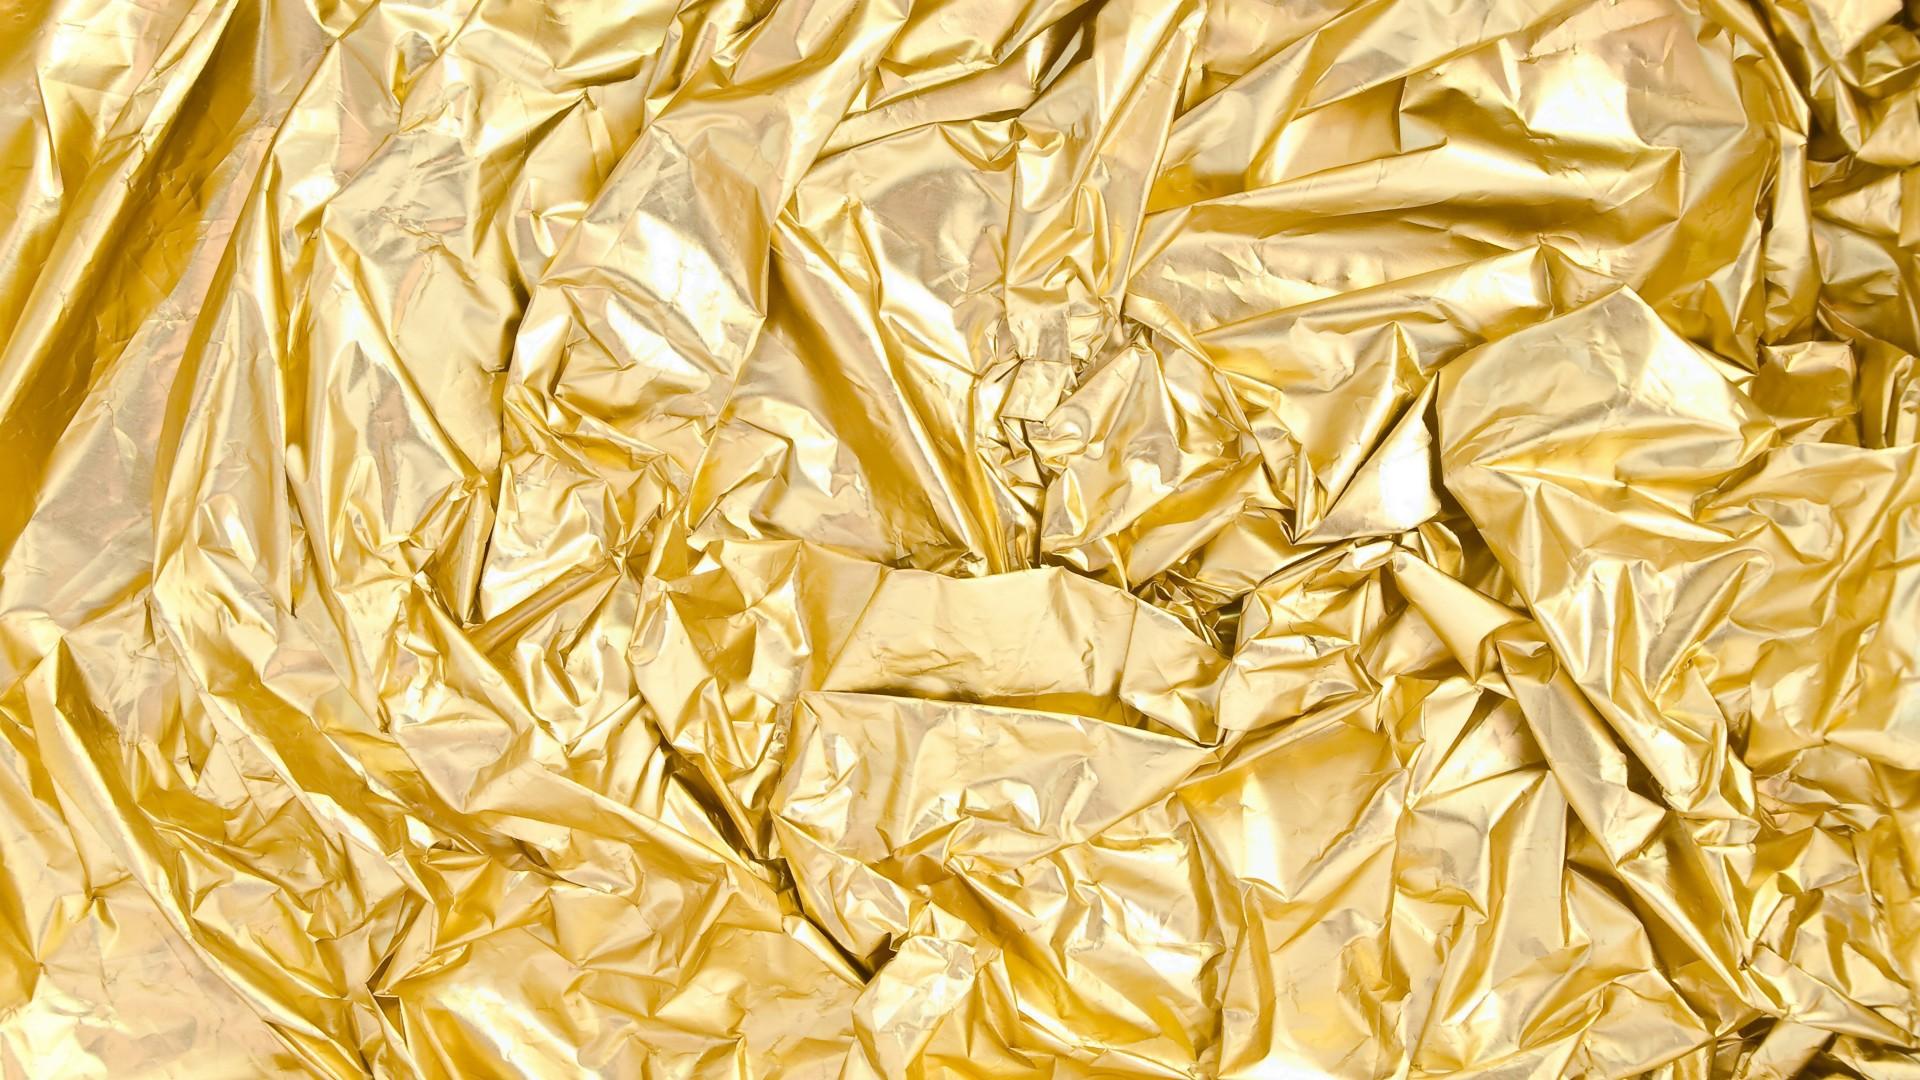 gold satin background - photo #38